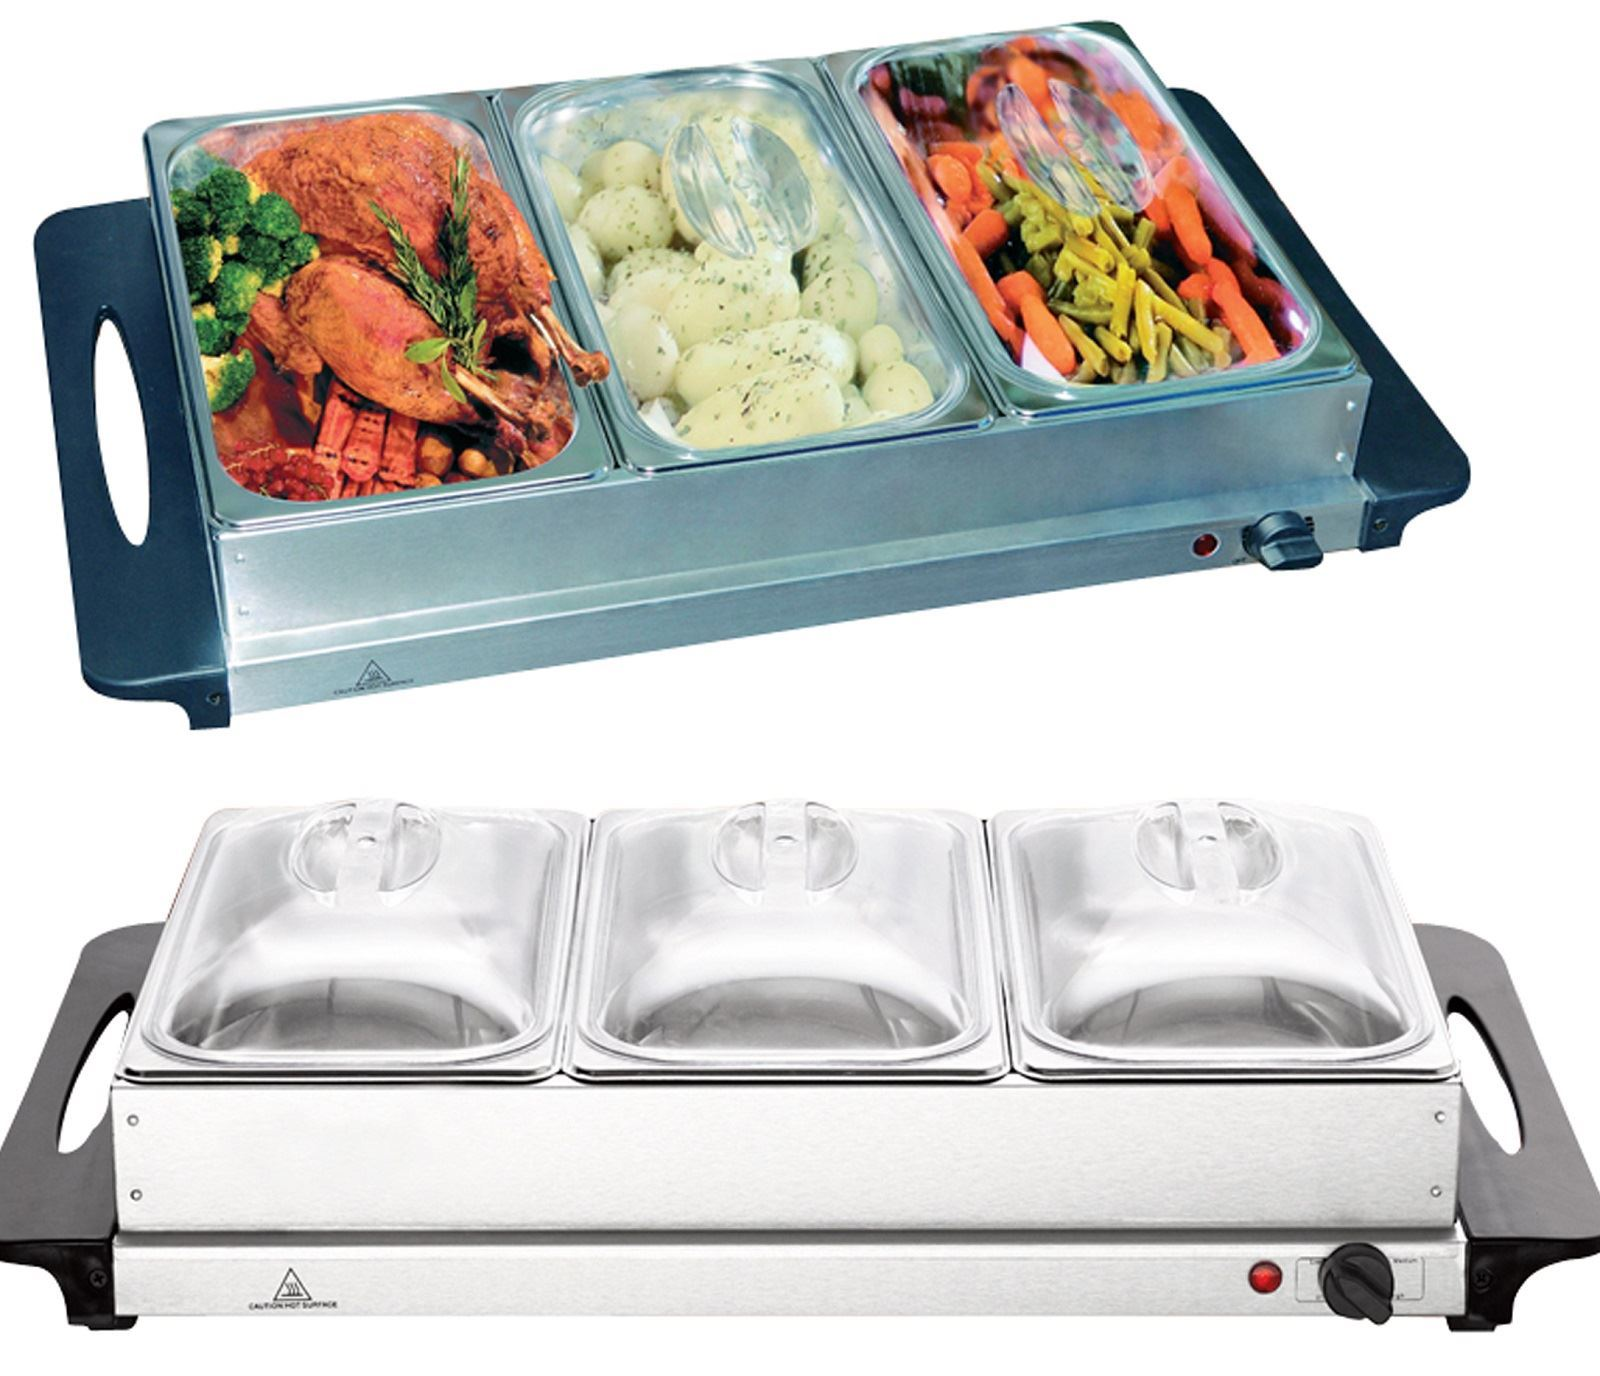 Vinsani Stainless Steel Electric 3 Pan Buffet Food Warmer Dinner ...